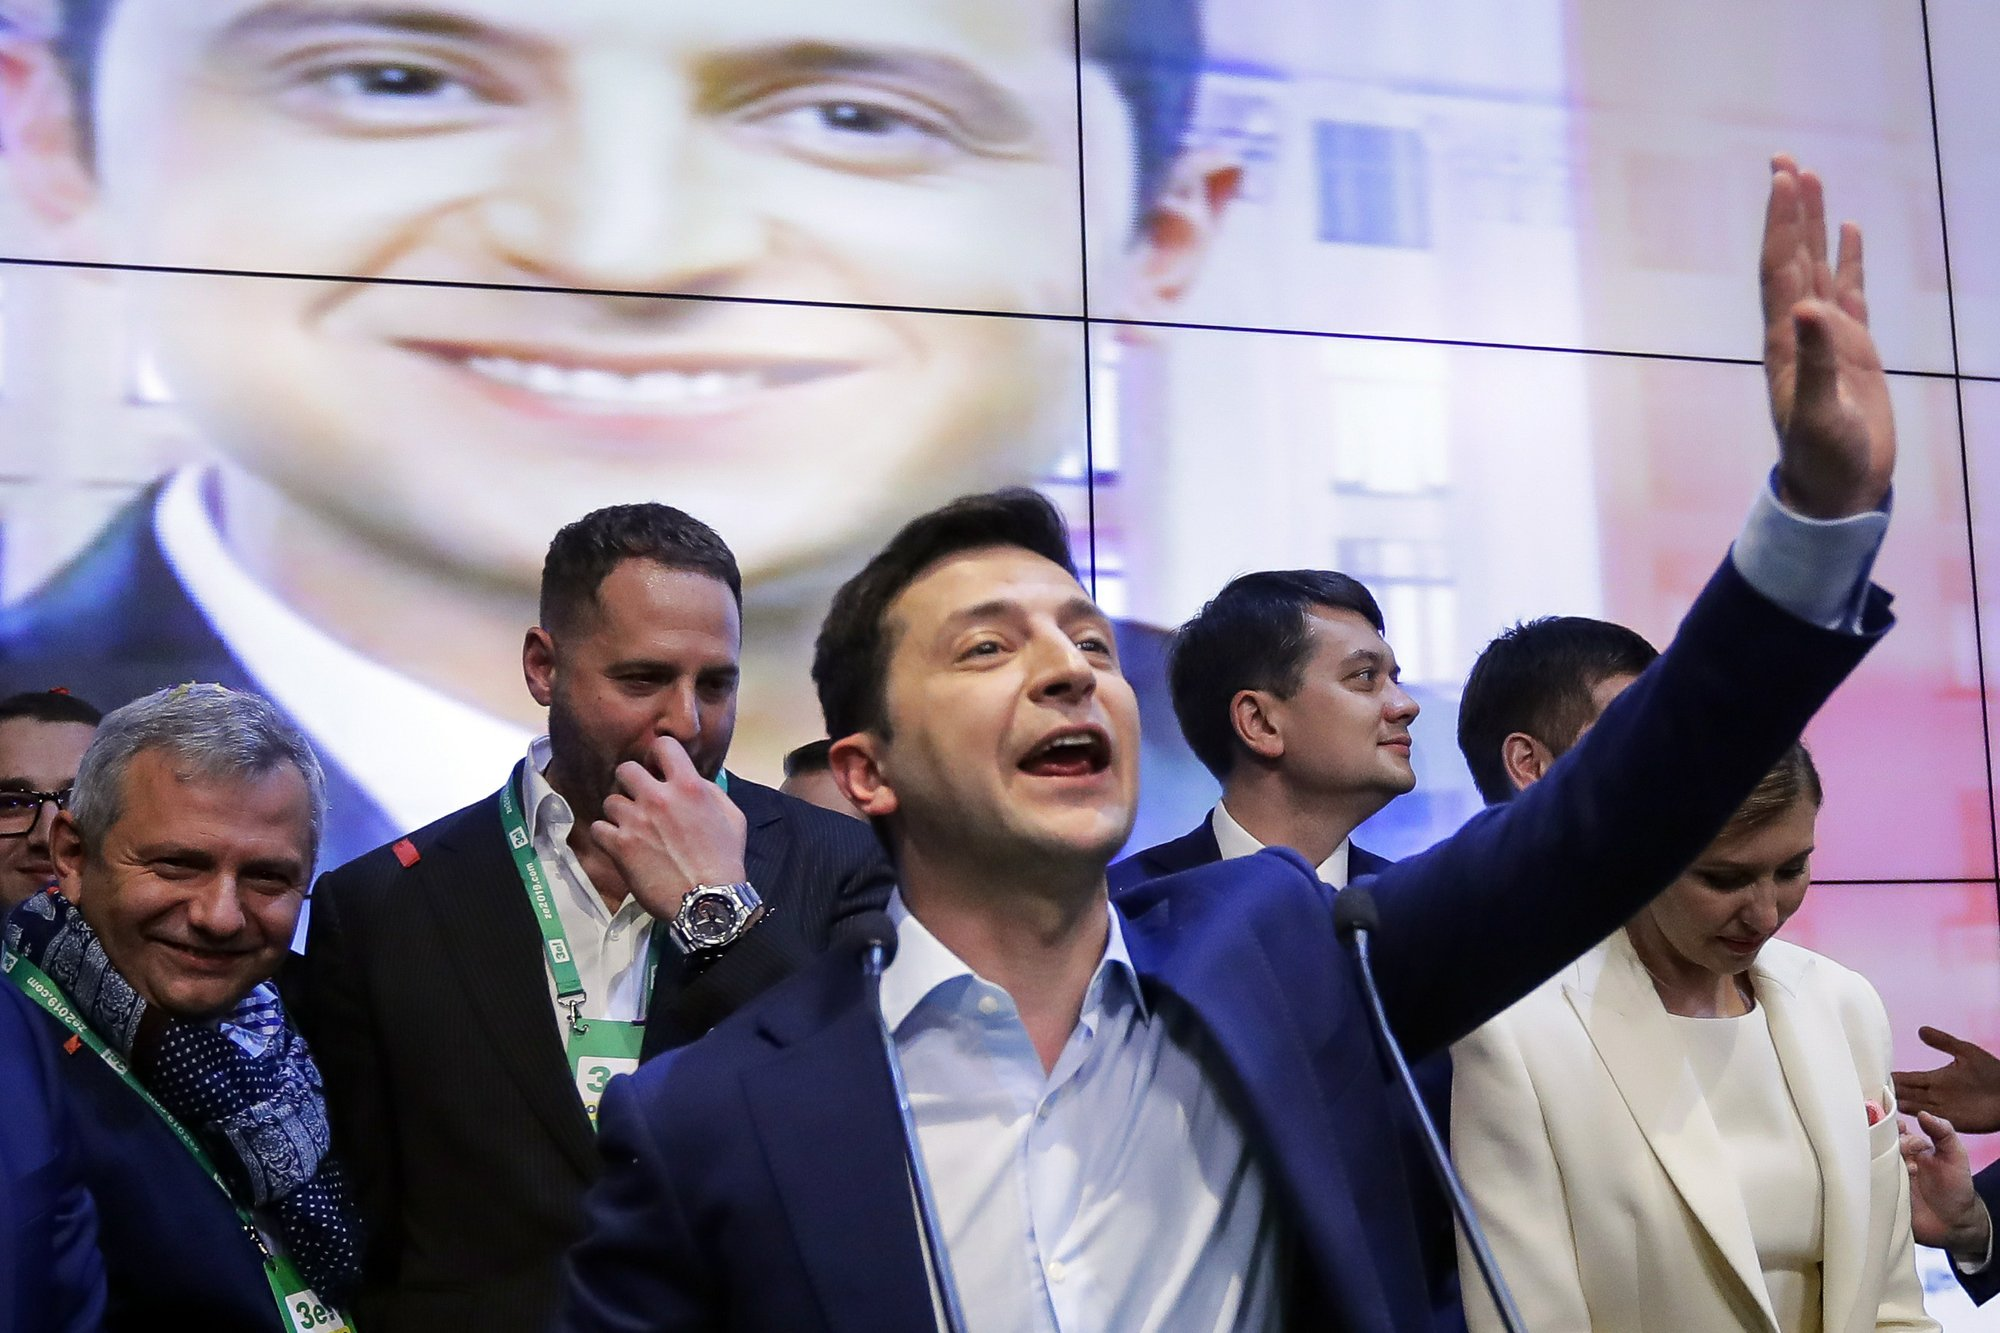 Ukrainian leader felt Trump pressure before taking office